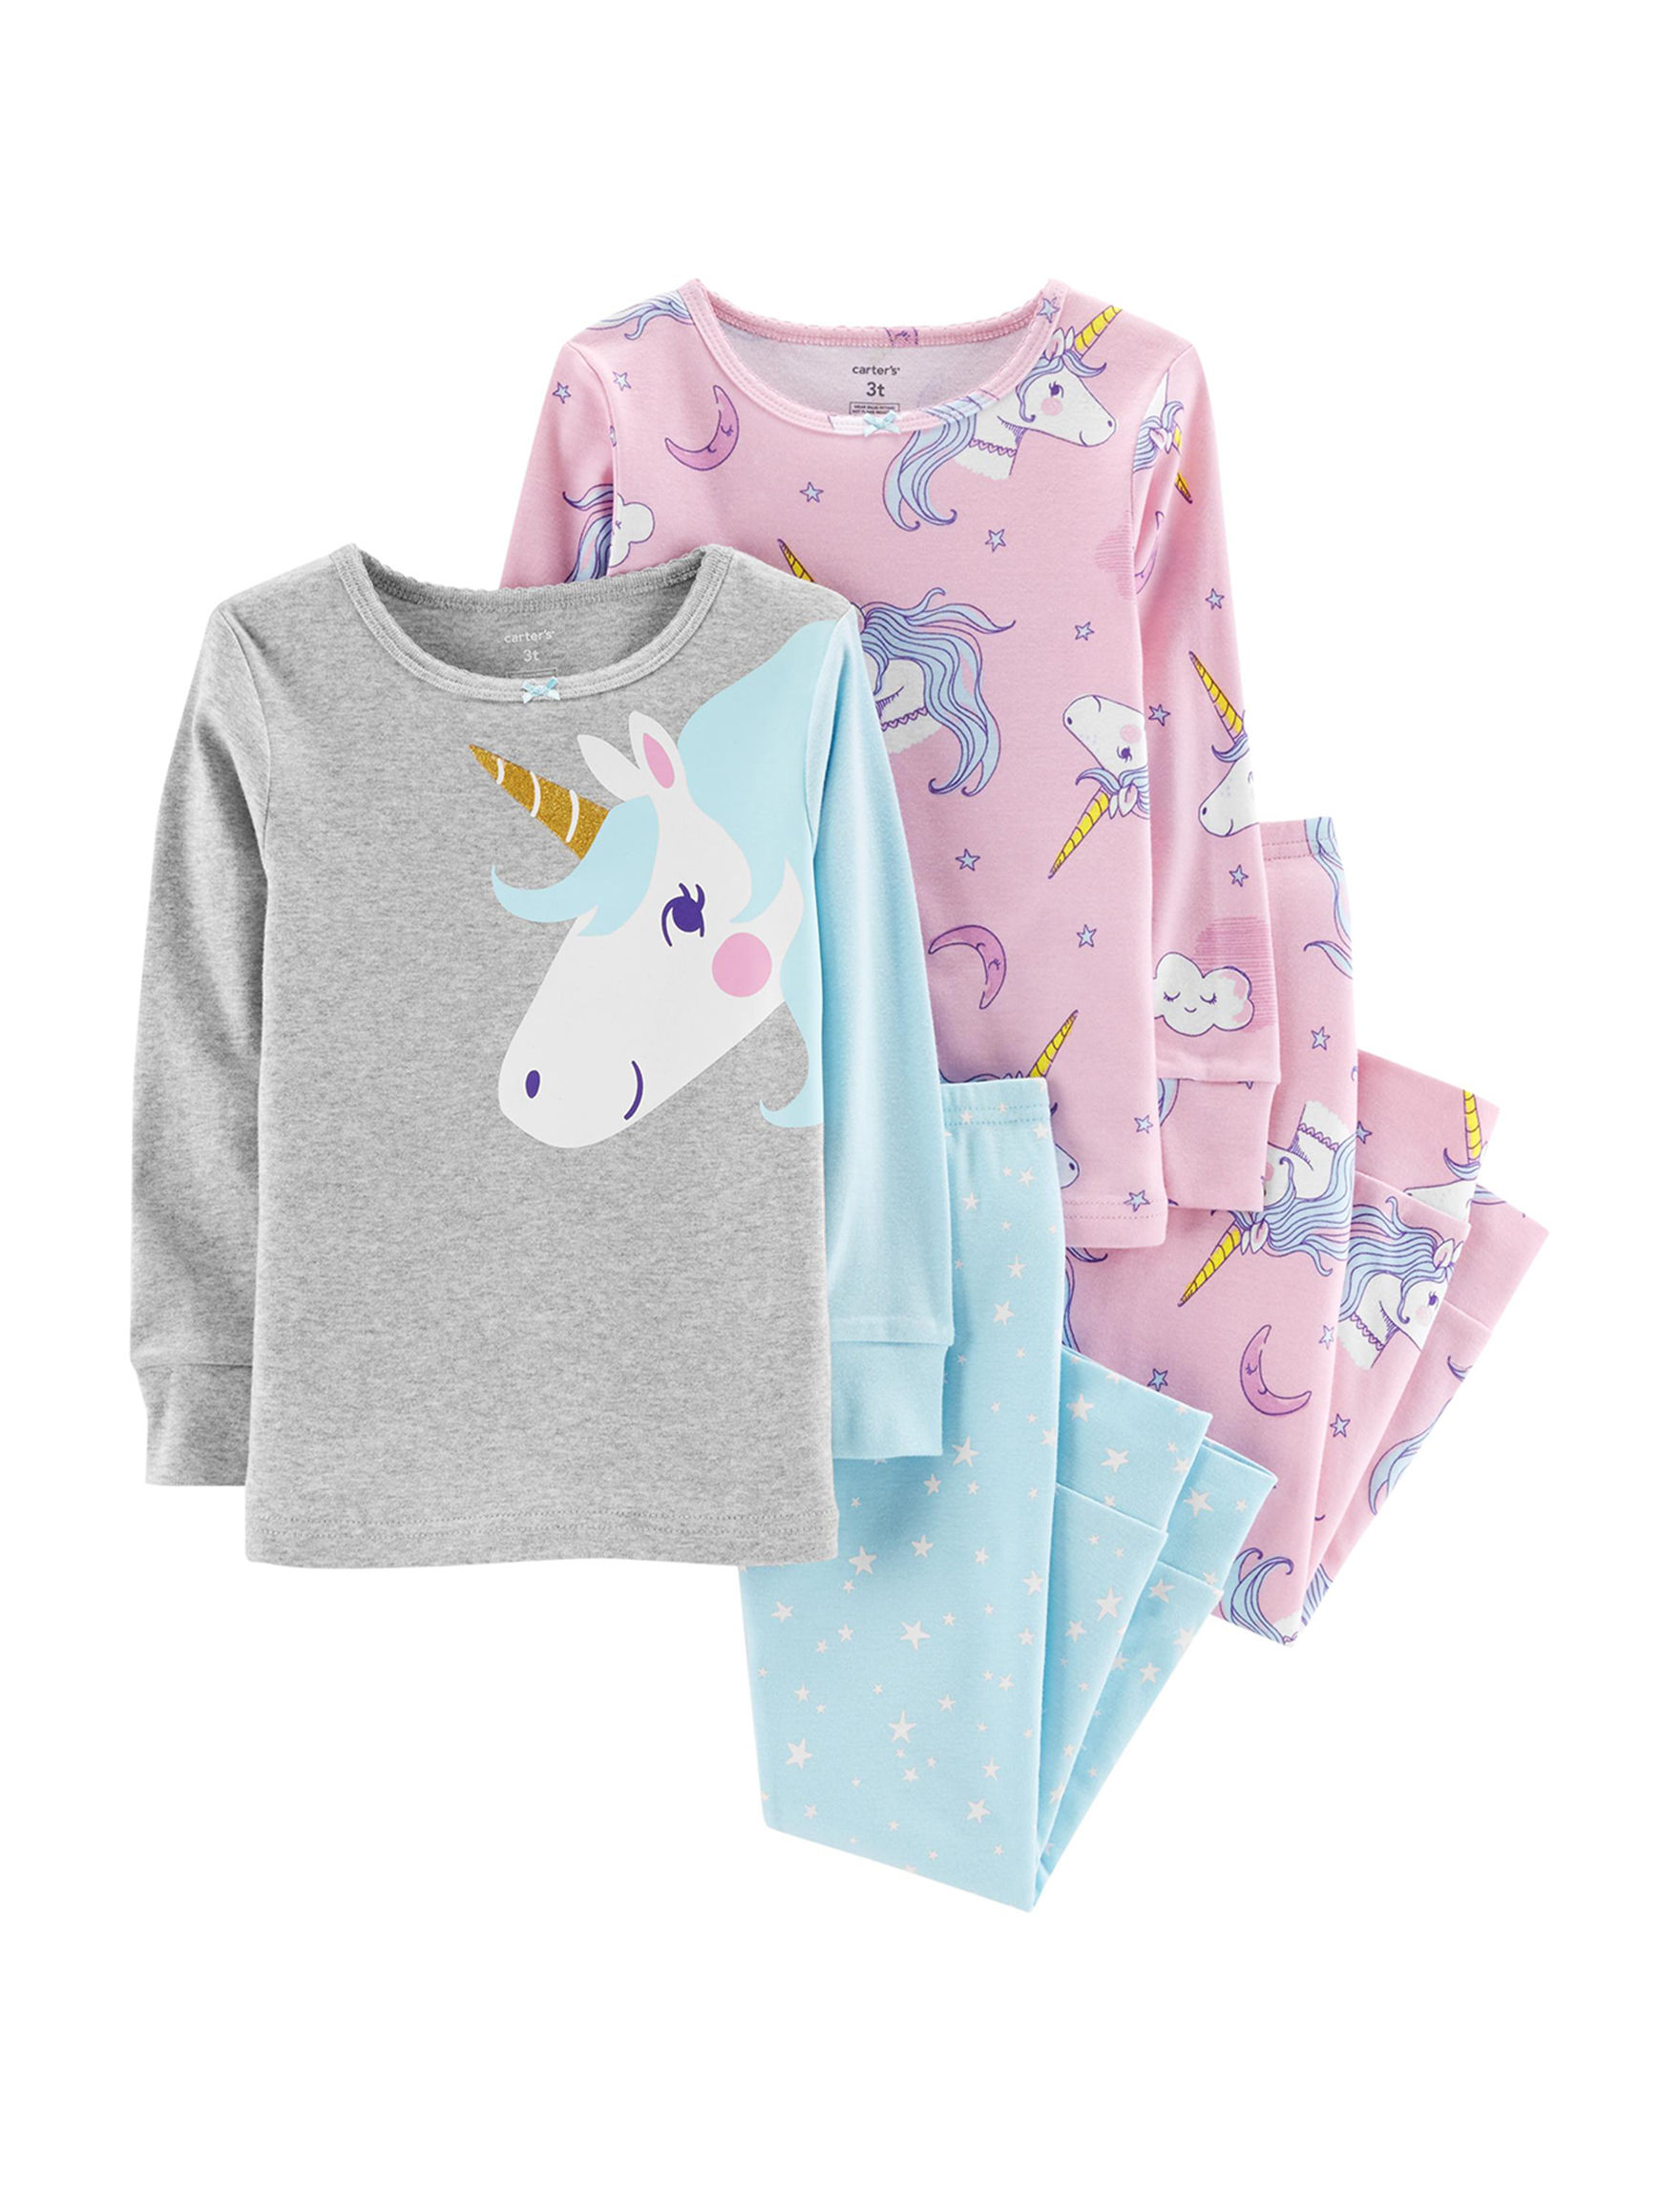 Carter's Blue / Pink Pajama Sets